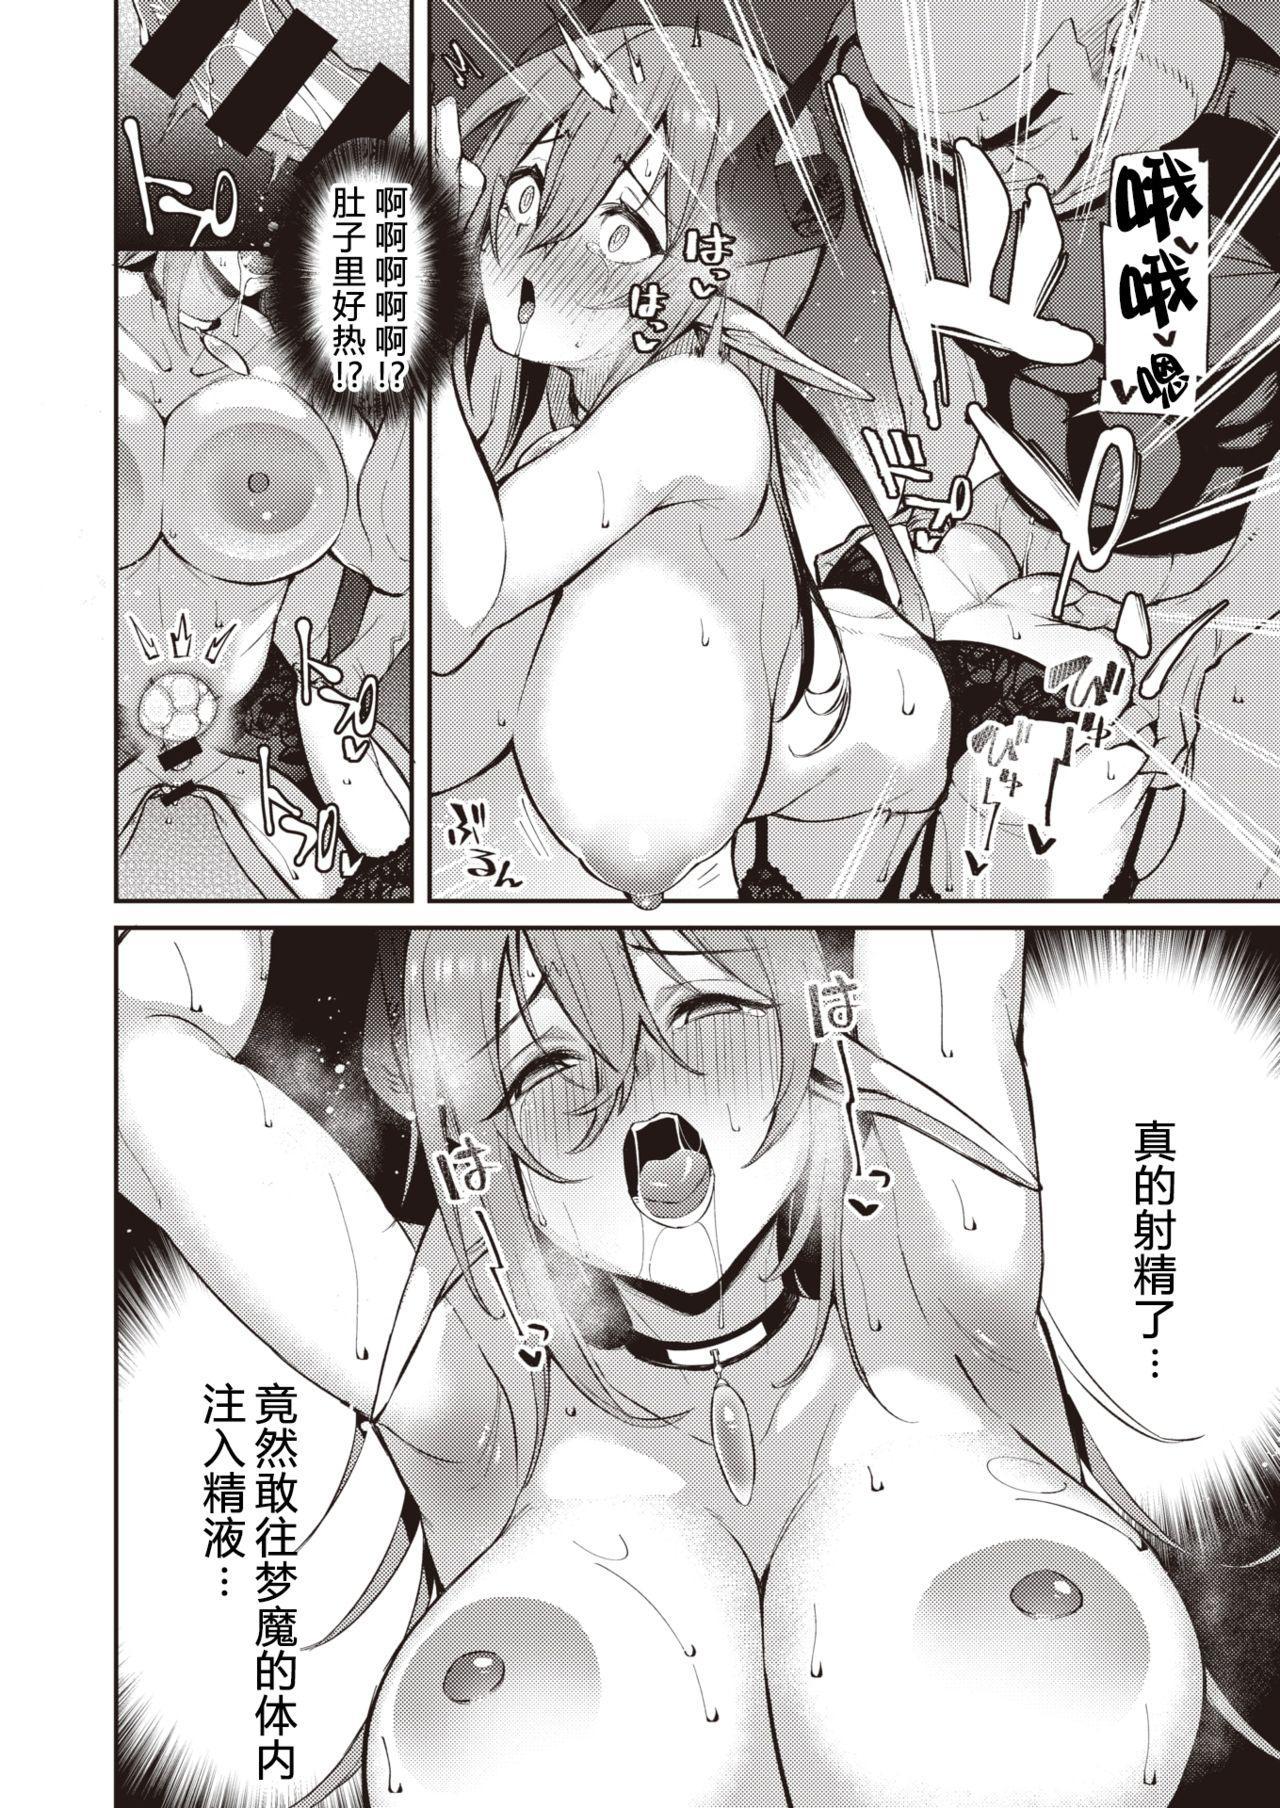 [Shingo.] Tsukiyo no Lilli ~The Workaholic Succubus~ | 月夜下的莉莉~沉迷工作的梦魔~ (COMIC Kairakuten BEAST 2020-06) [Chinese] [原来如此万能事务所汉化组] [Digital] 12